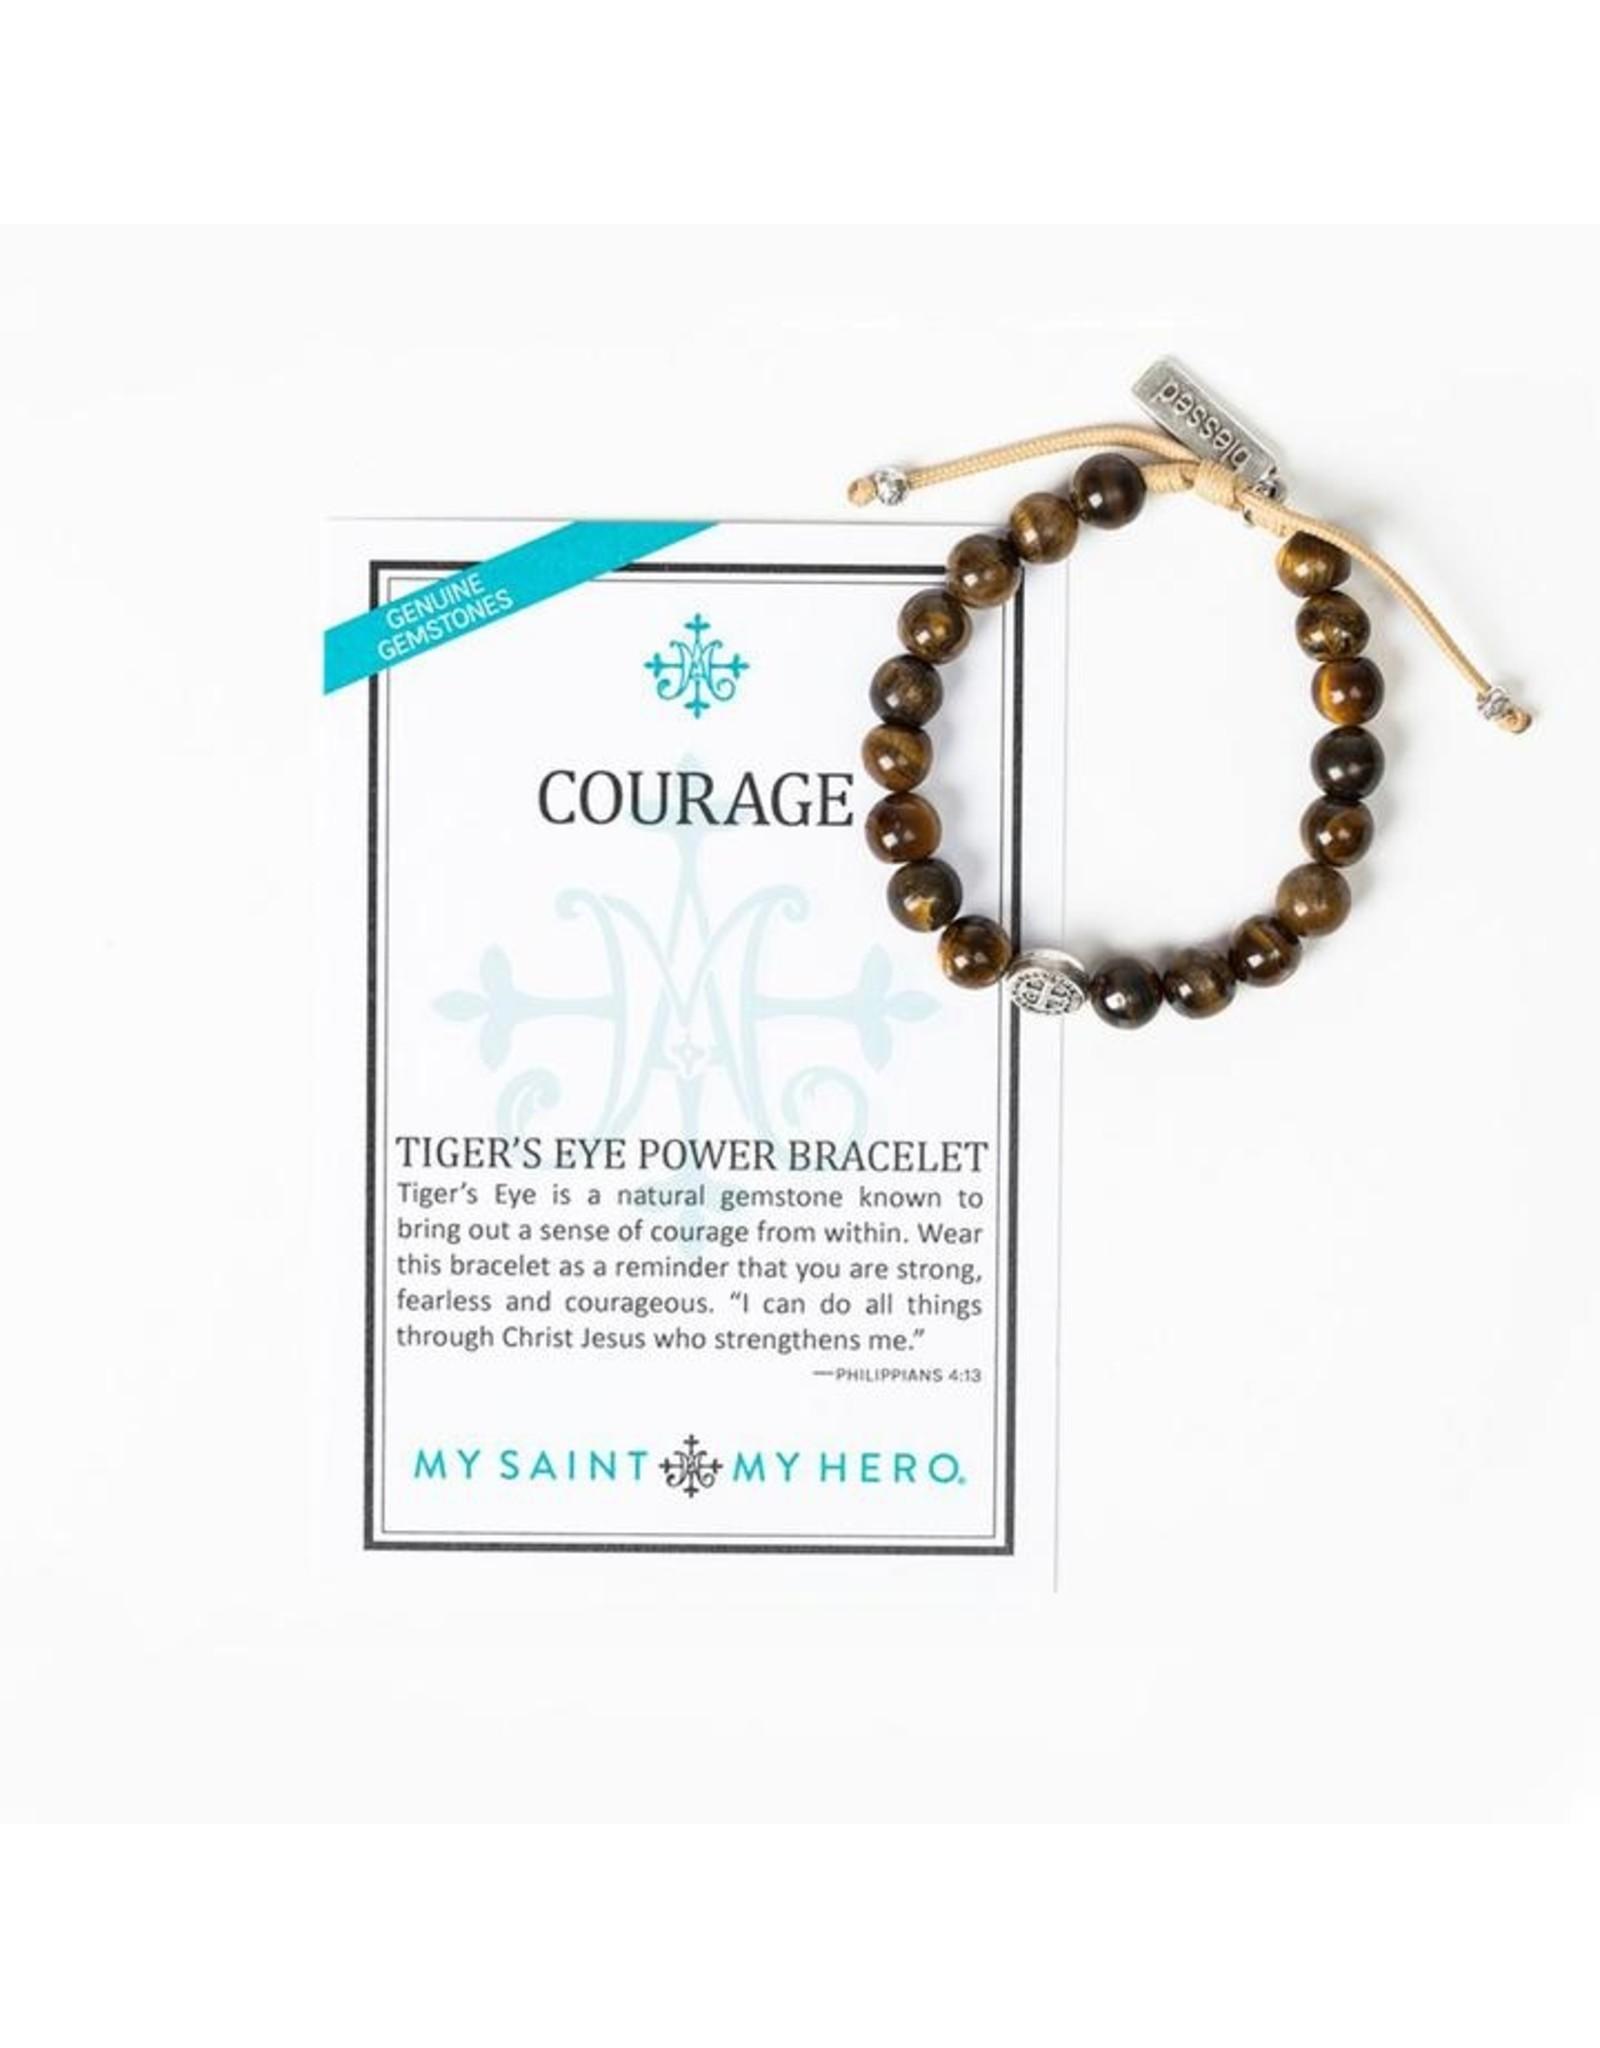 MSMH Courage Power Bracelet